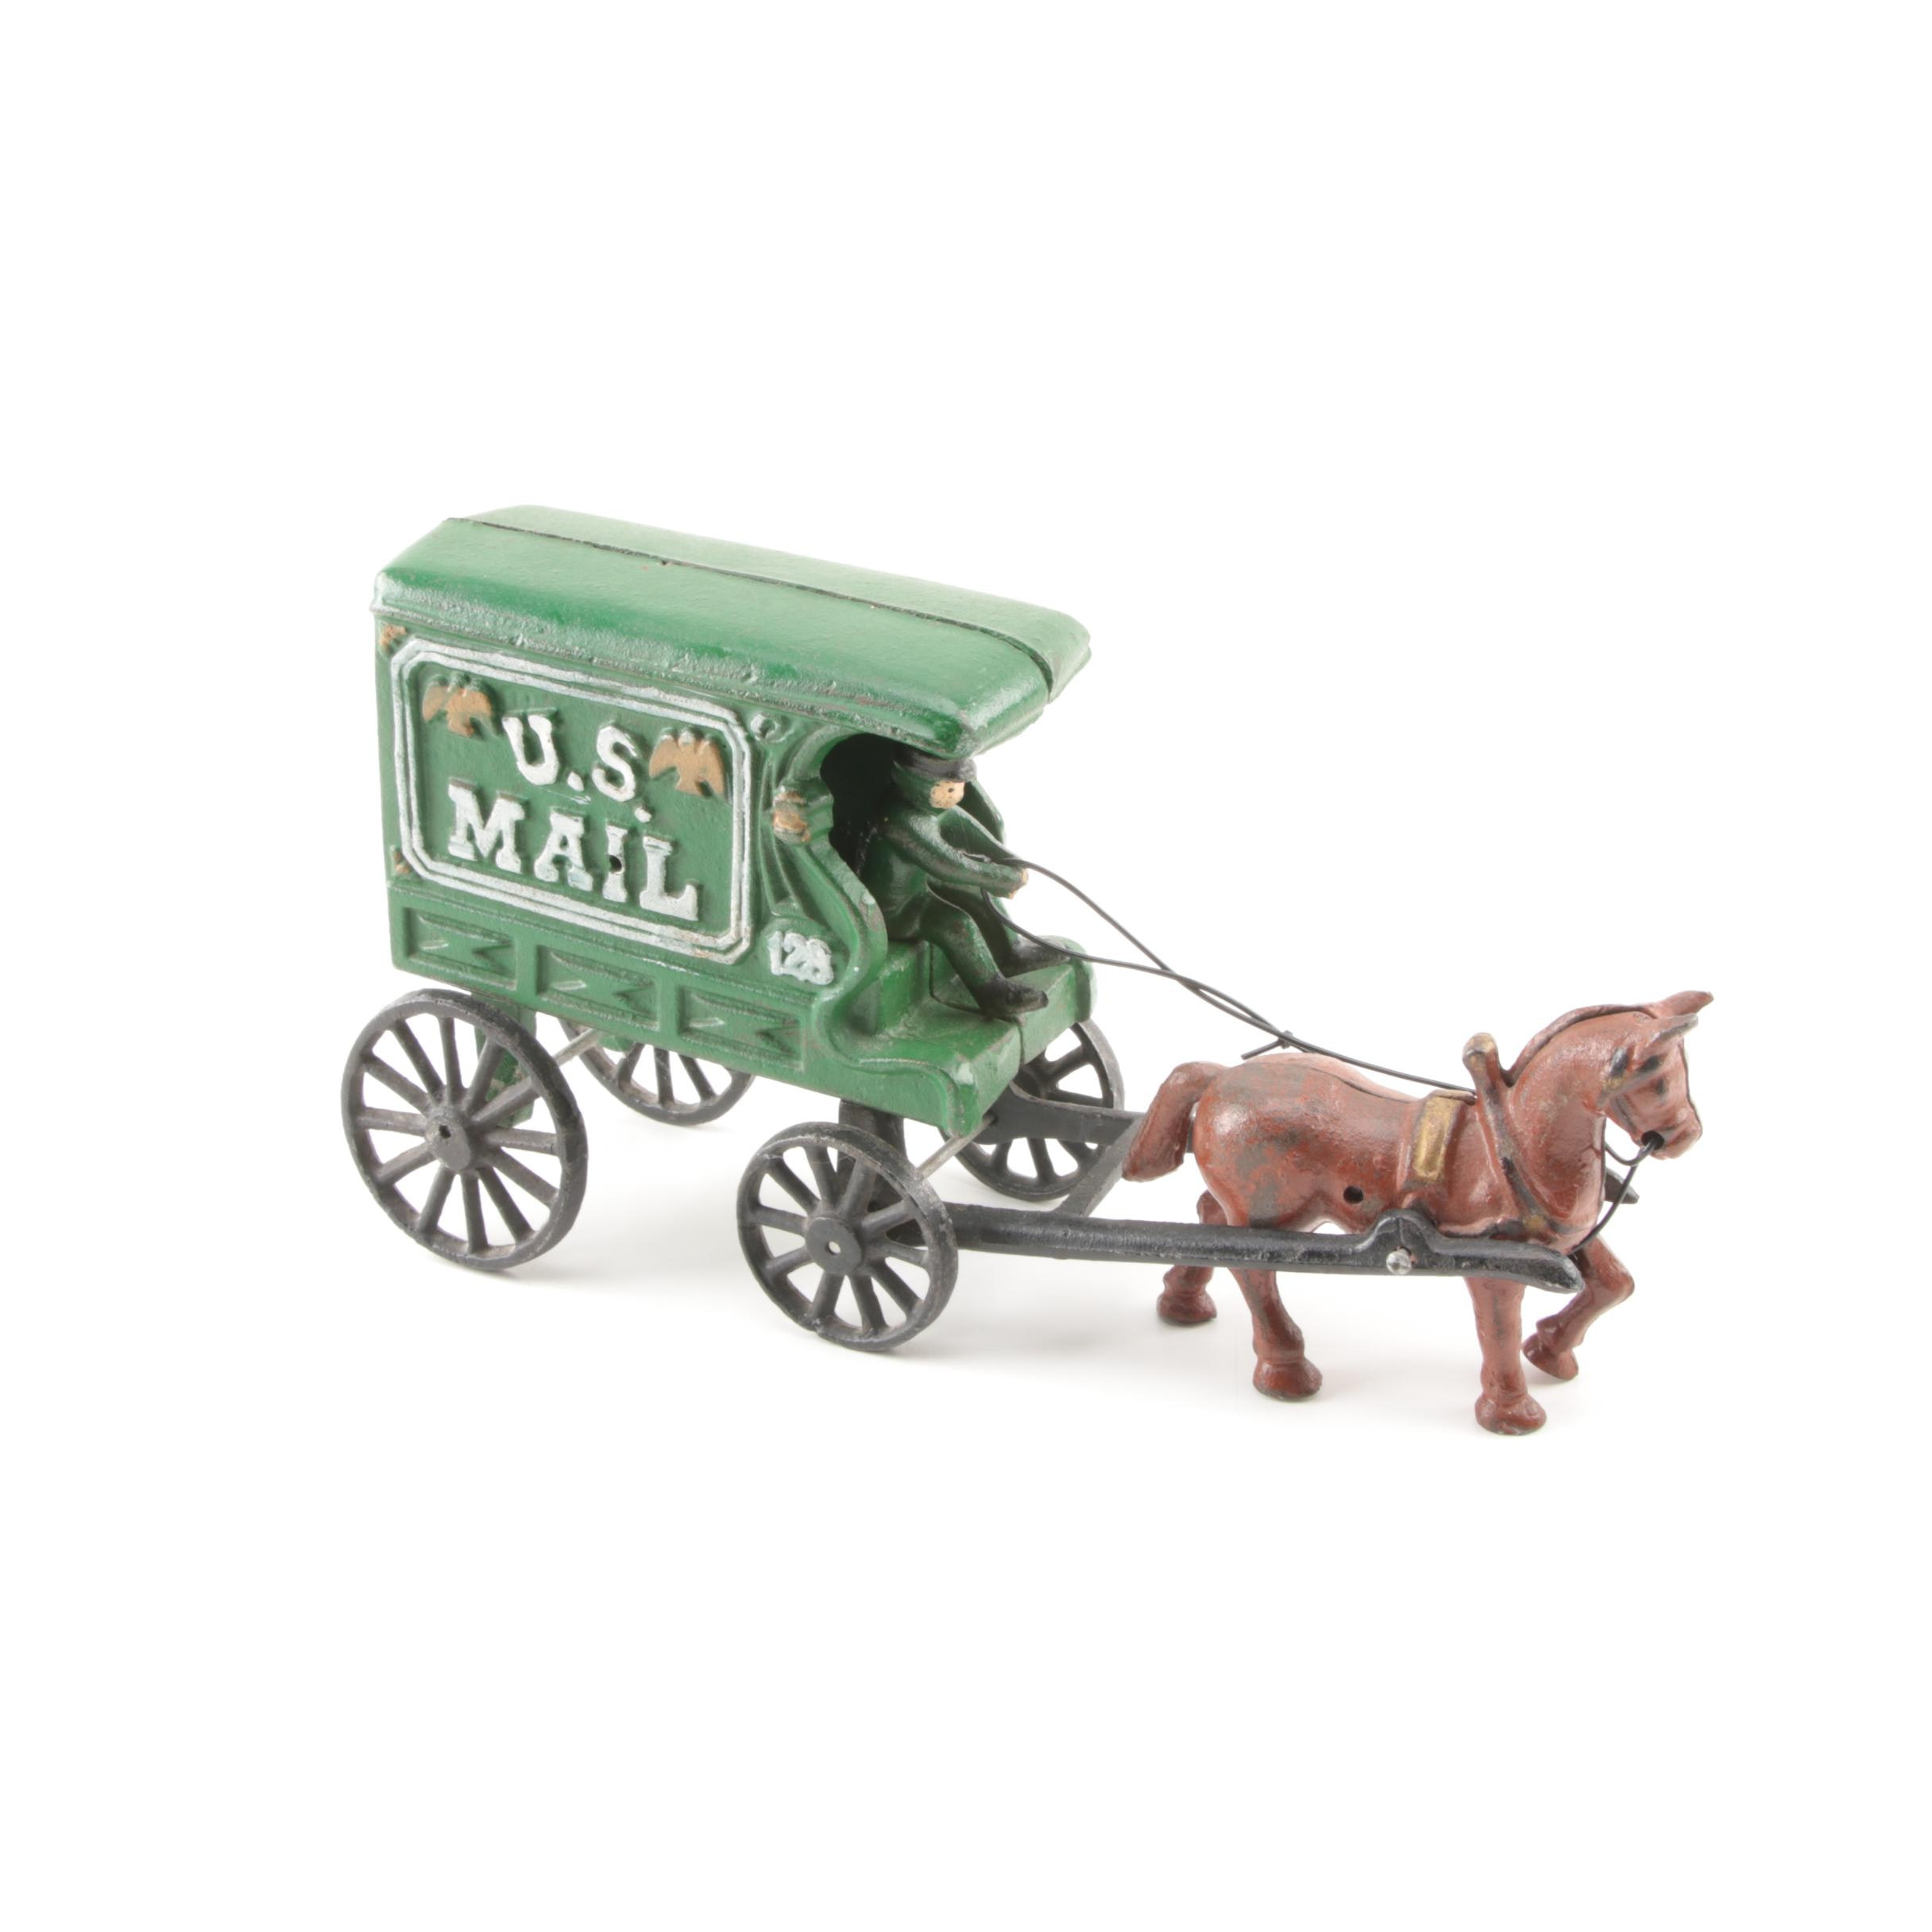 Cast Iron U.S Mail Horse Drawn Wagon